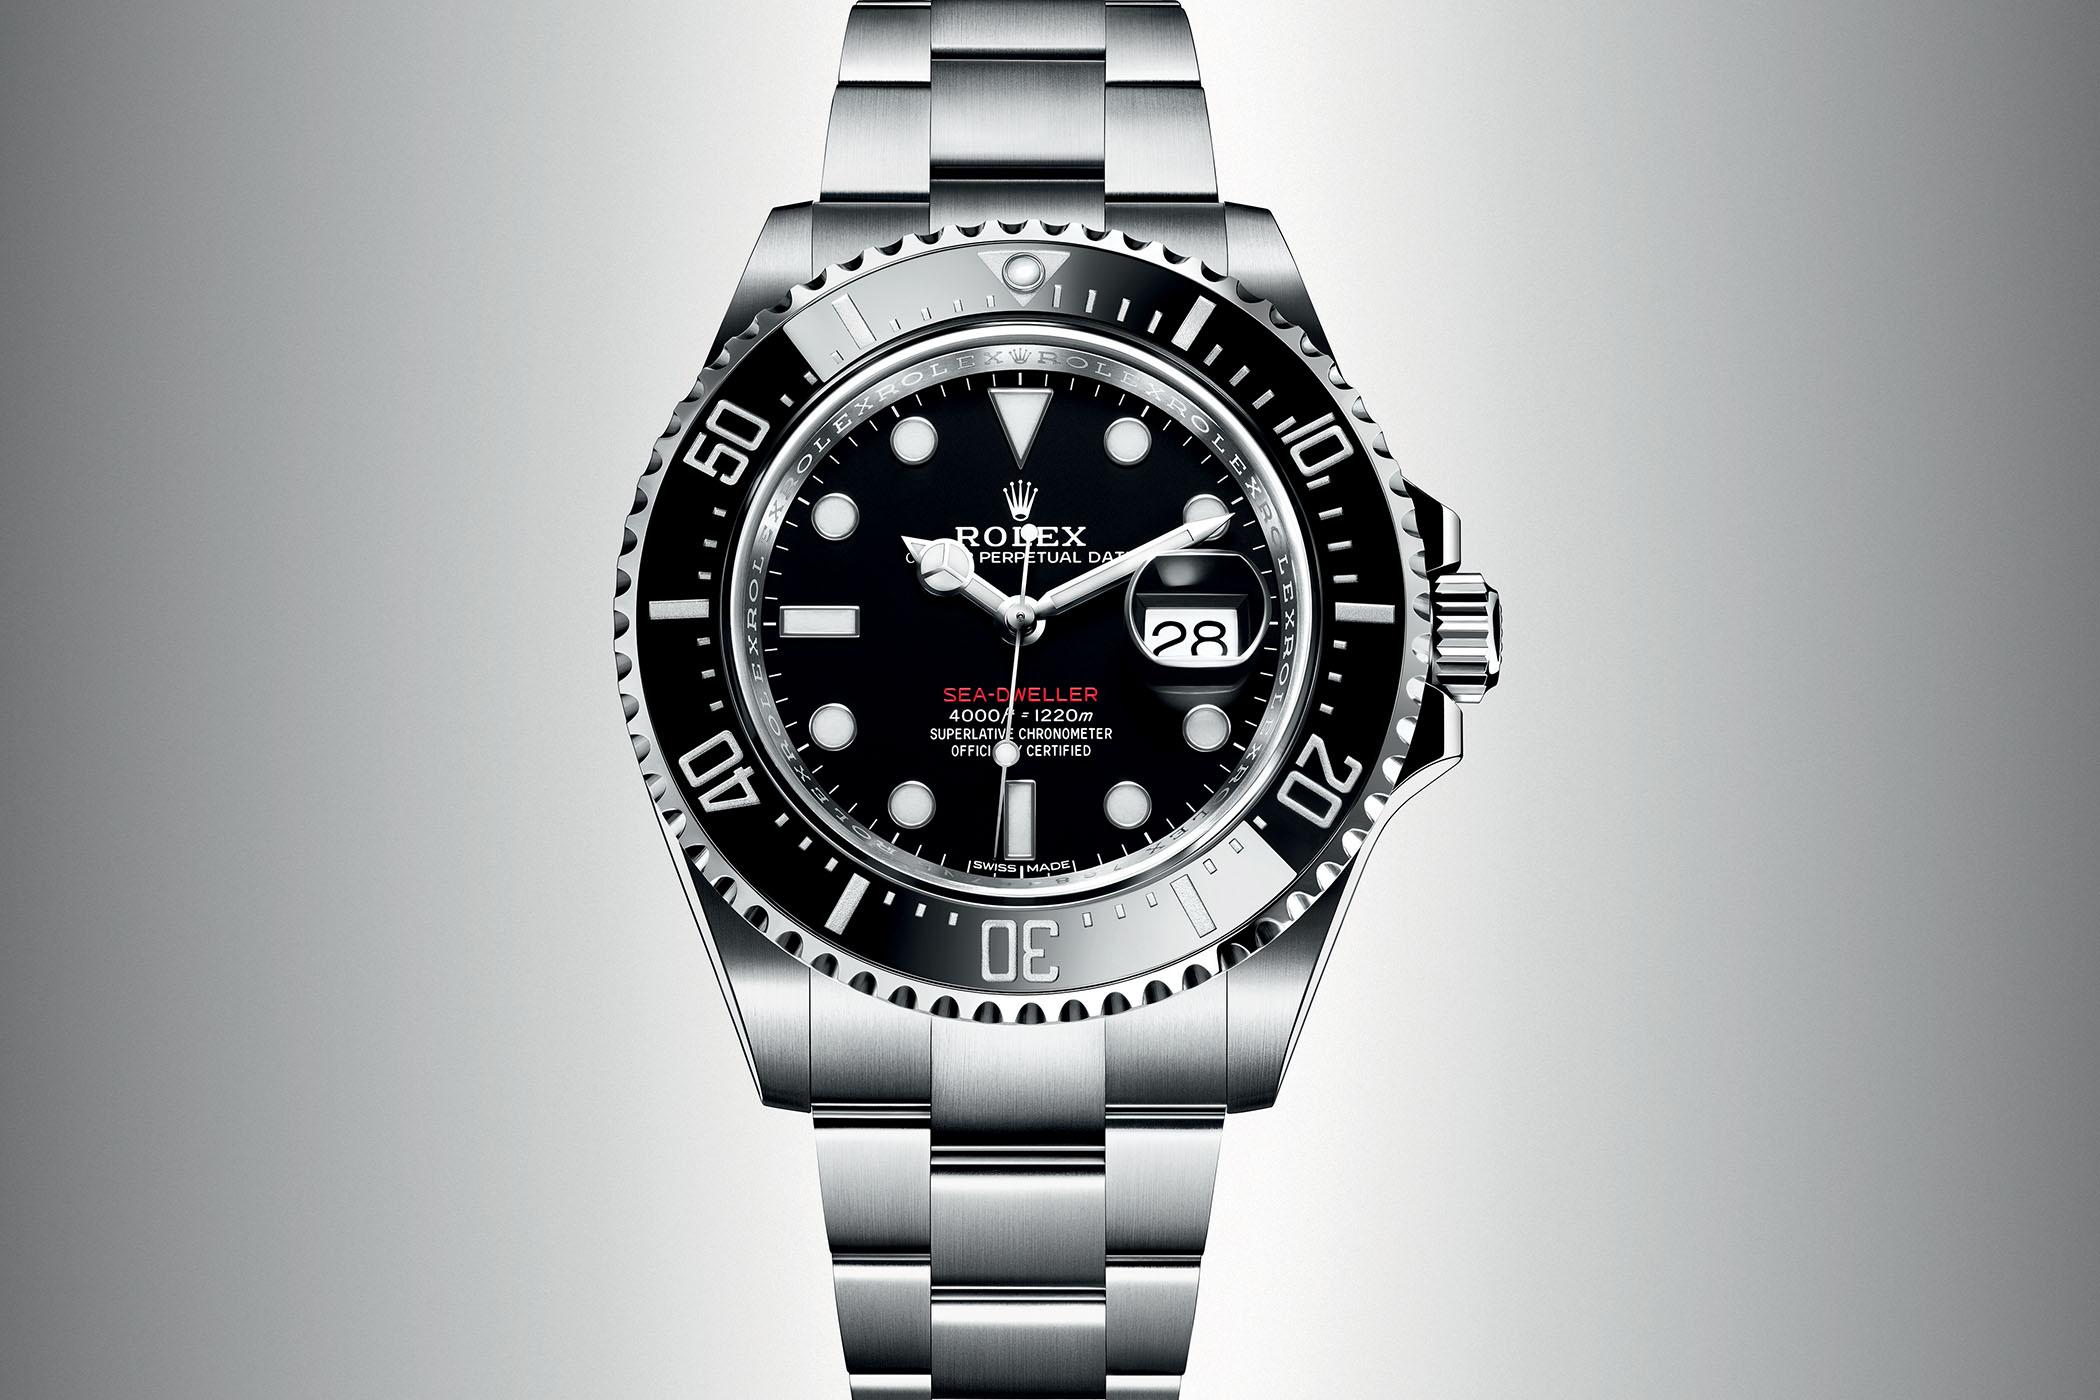 đồng hồ Rolex Sea-Dweller